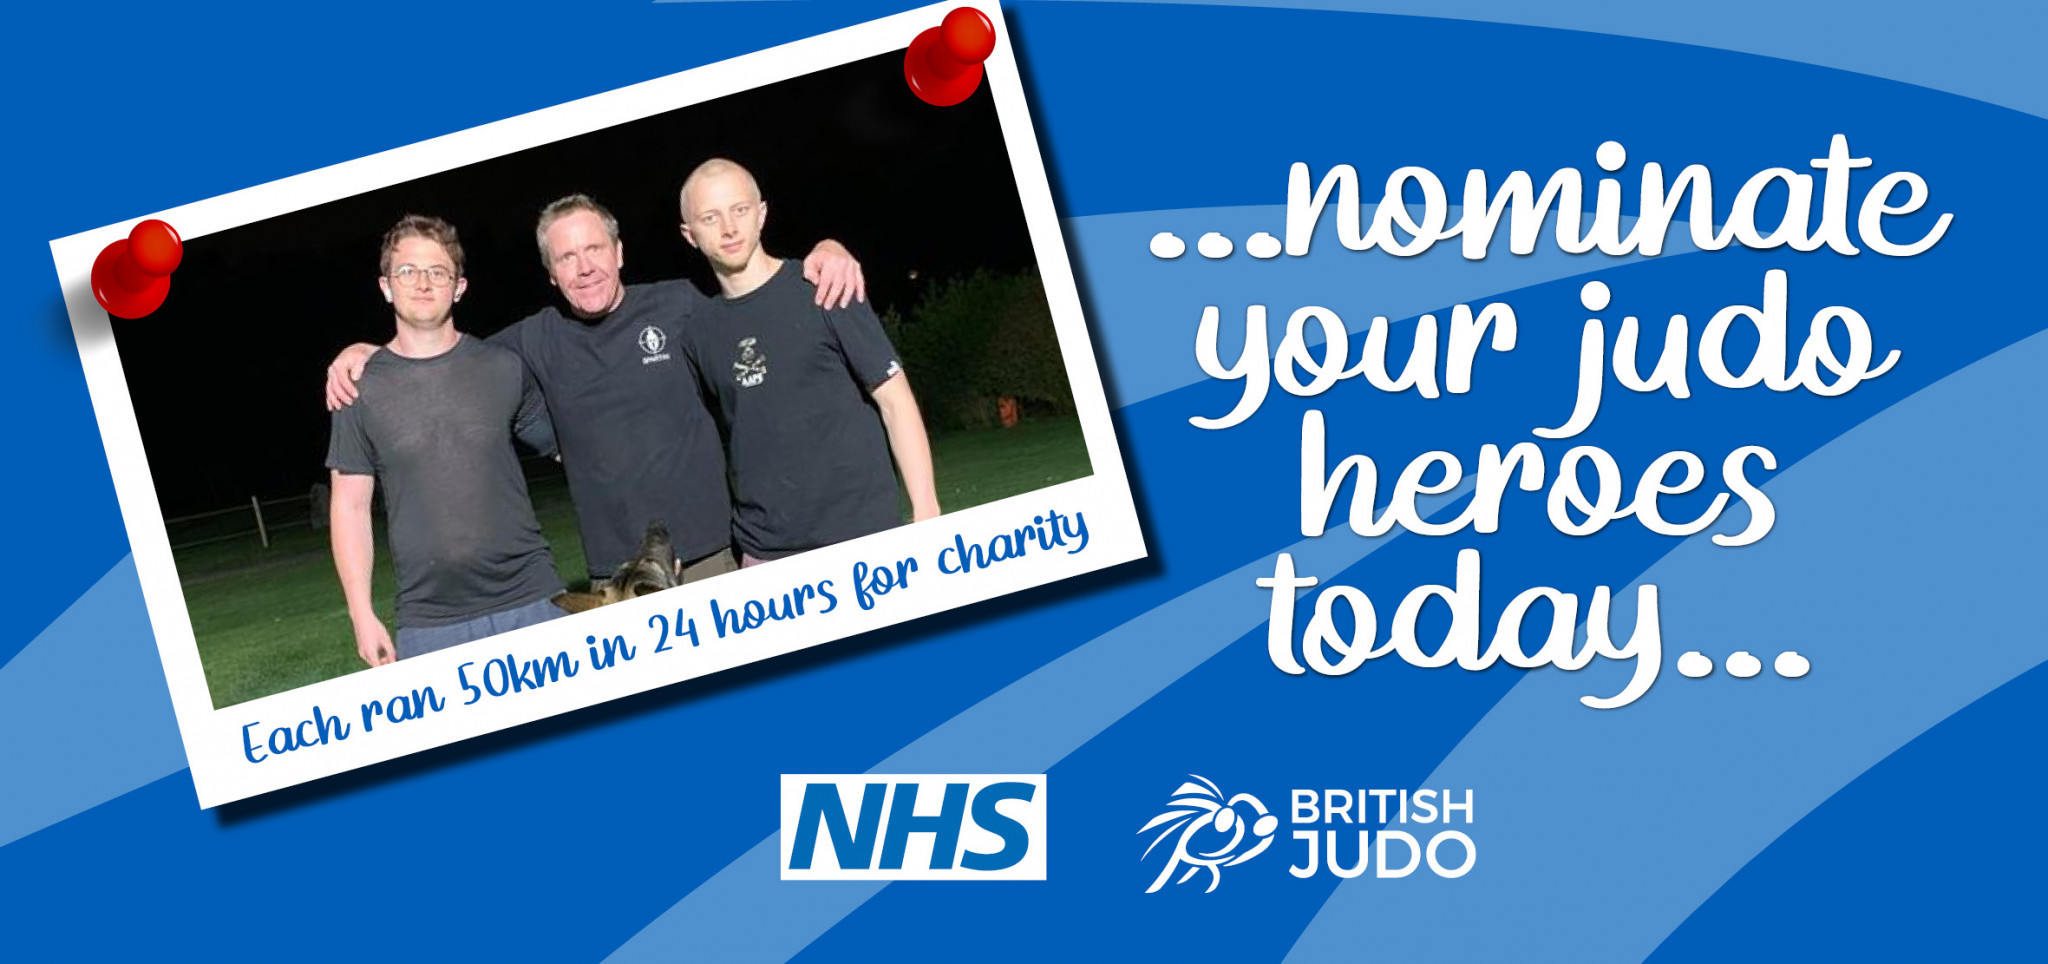 British Judo highlight heroes fighting COVID-19 pandemic